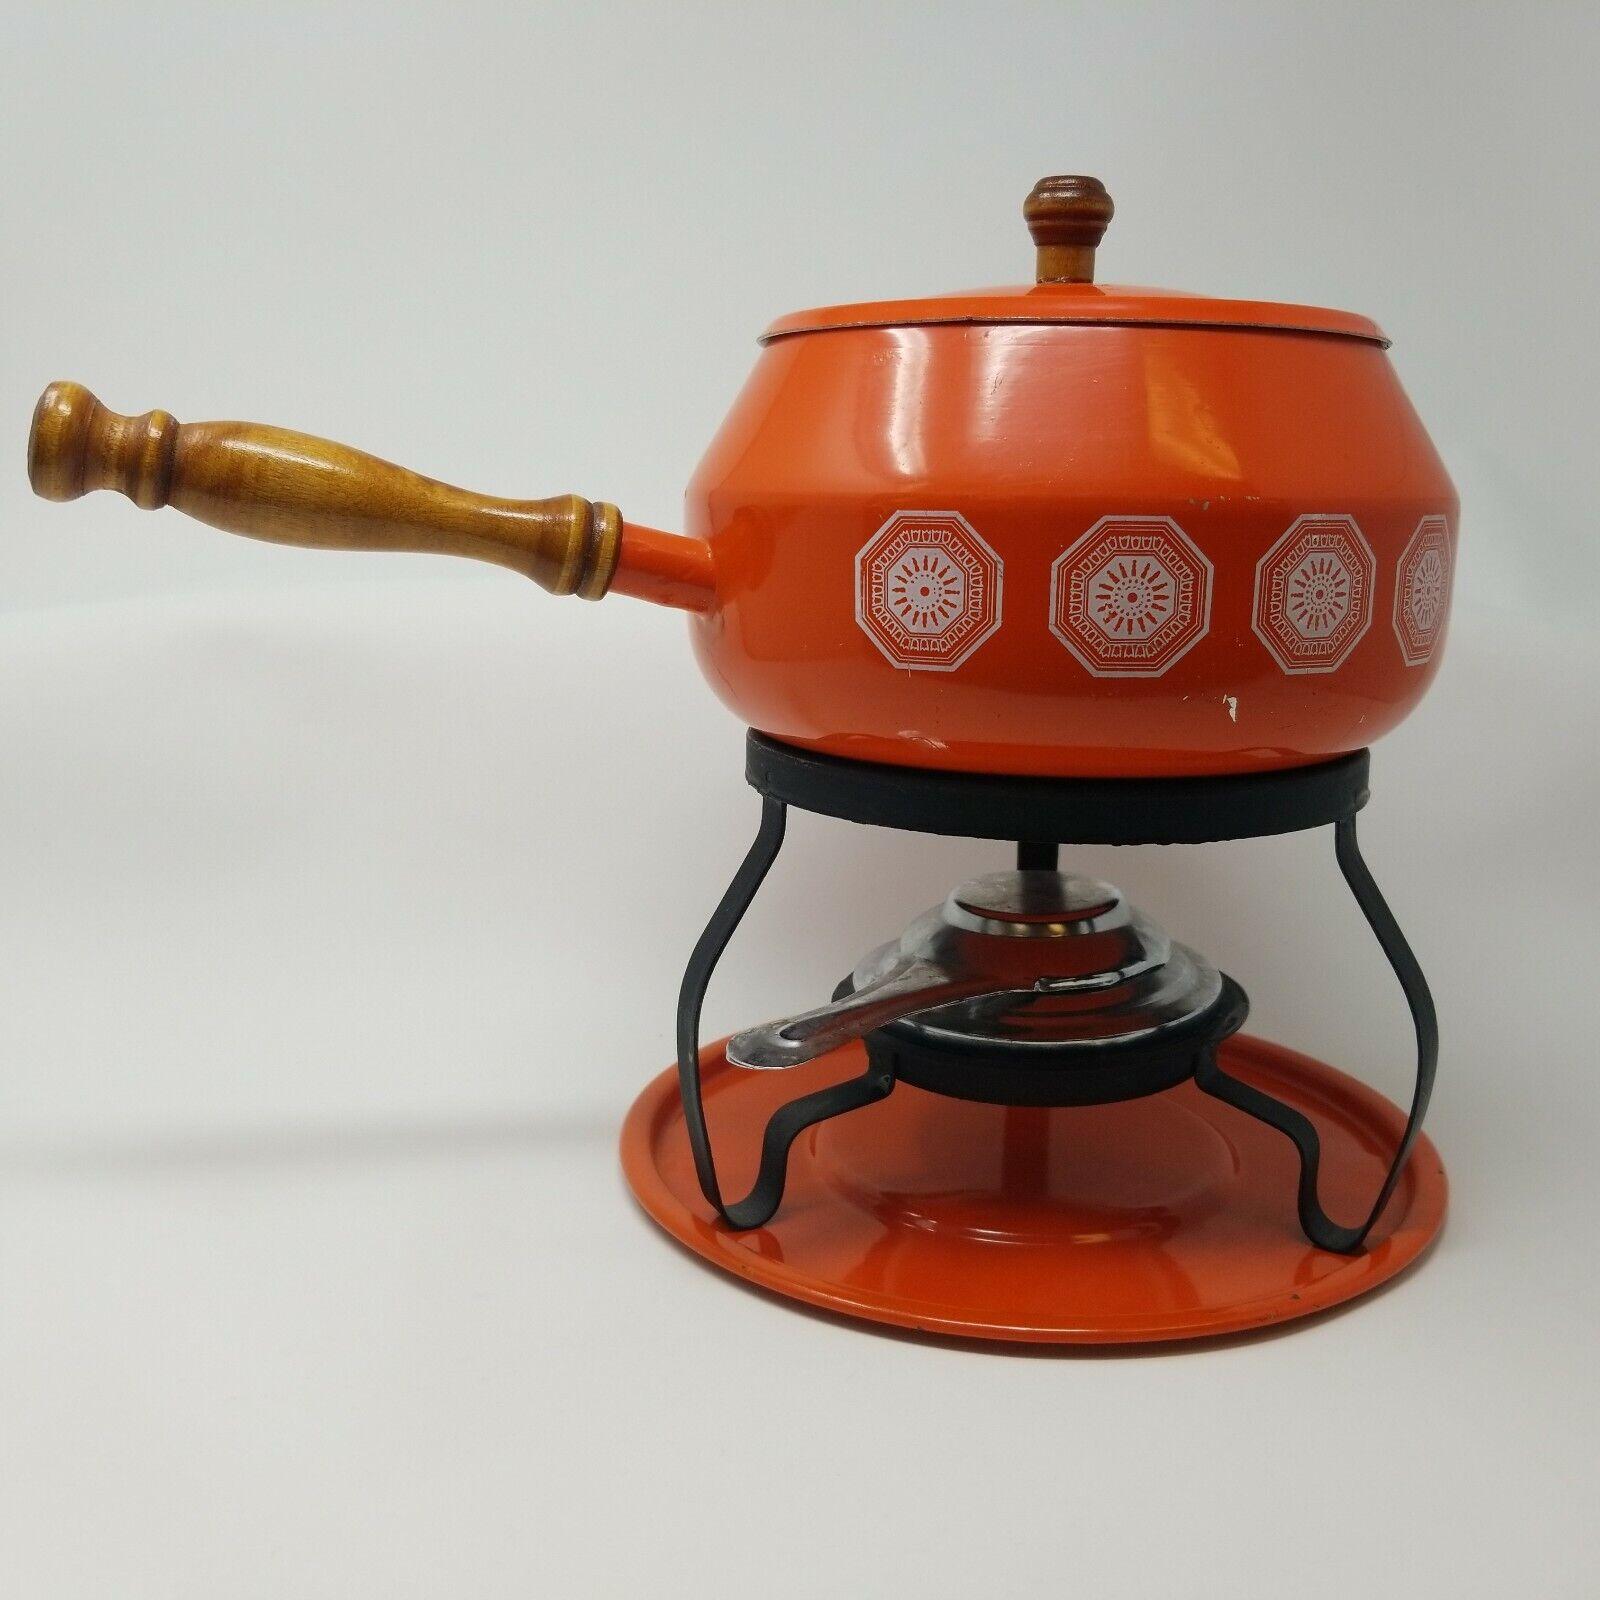 Vintage Danish Modern Mi Siècle le frougetement plat Food Warmer Fondue Orange